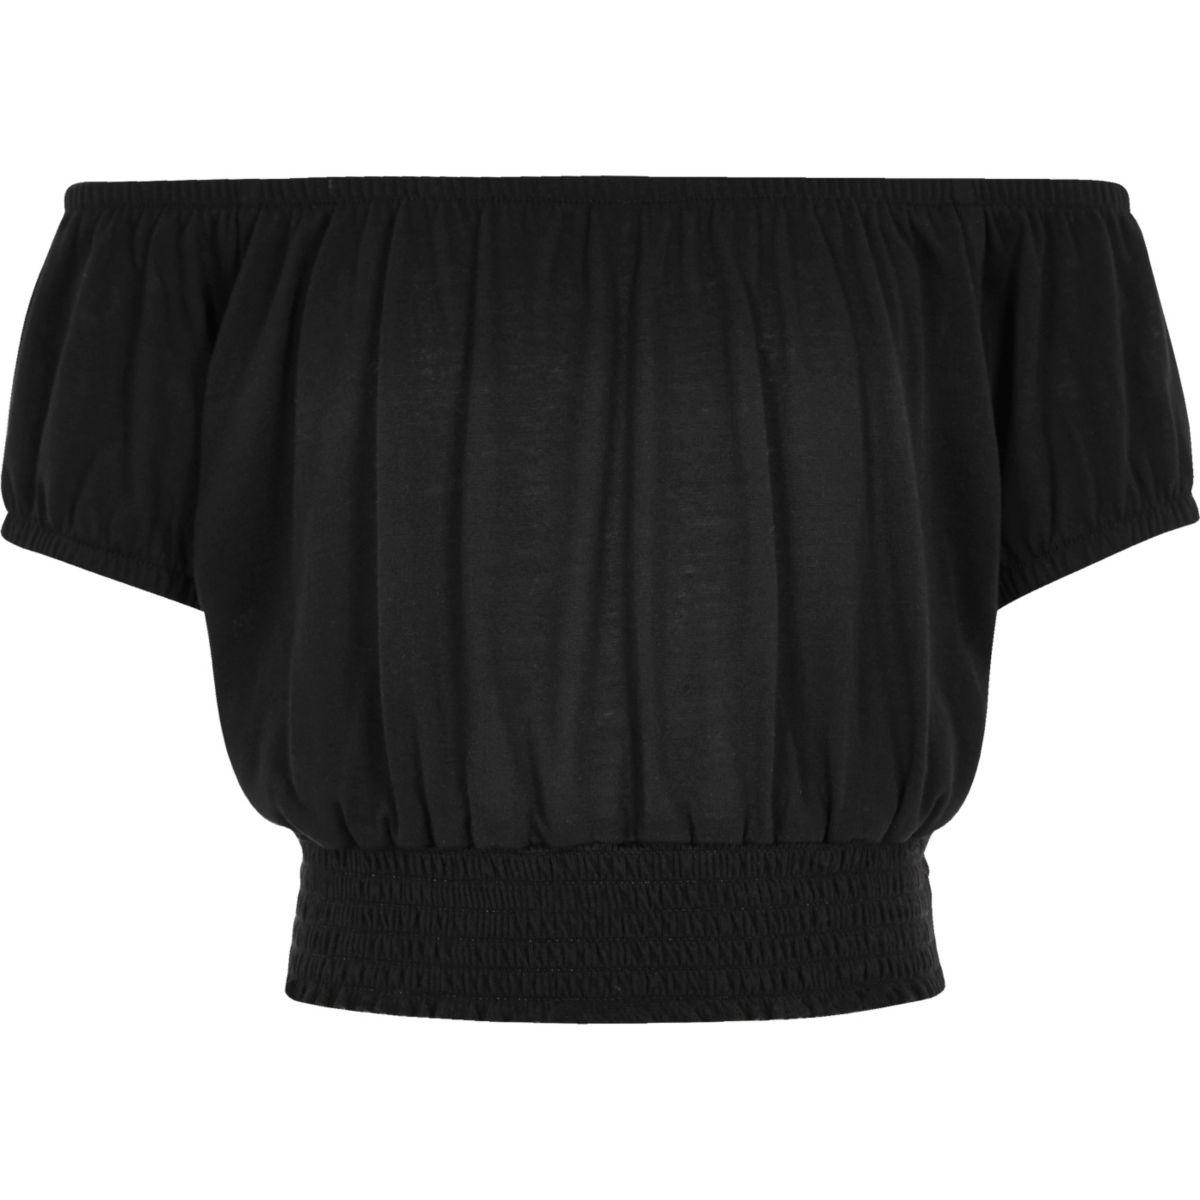 Girls black bardot top